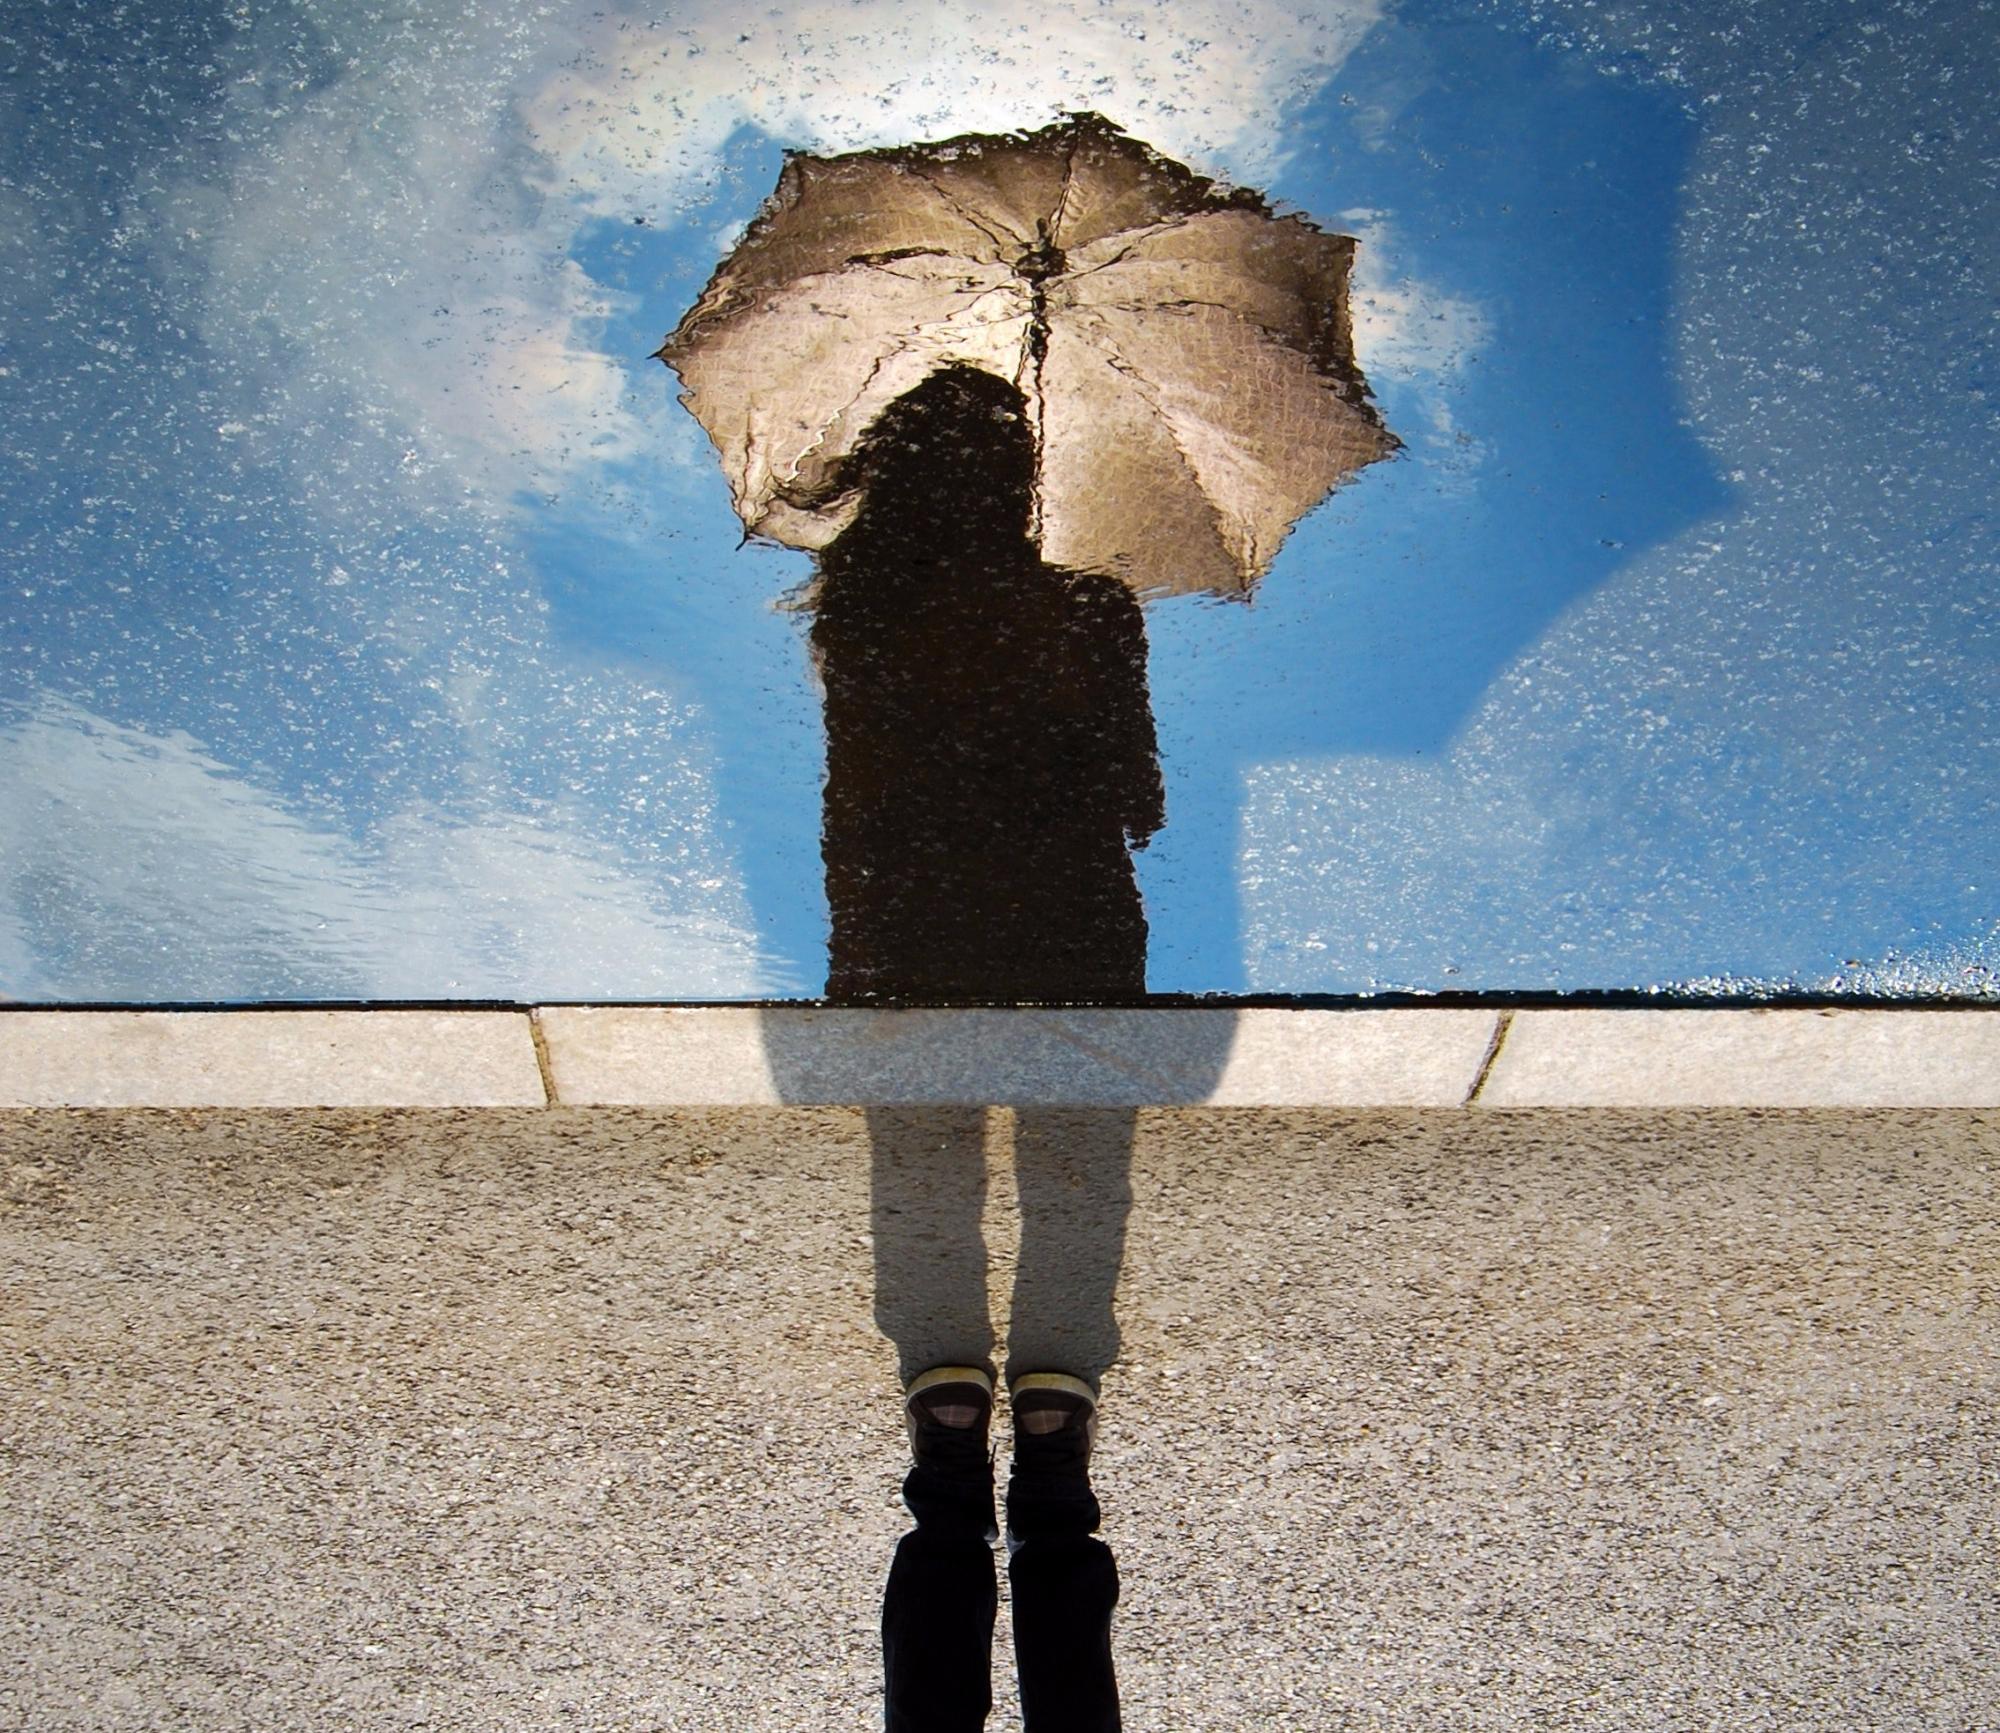 illusion of control-blog-mindeology